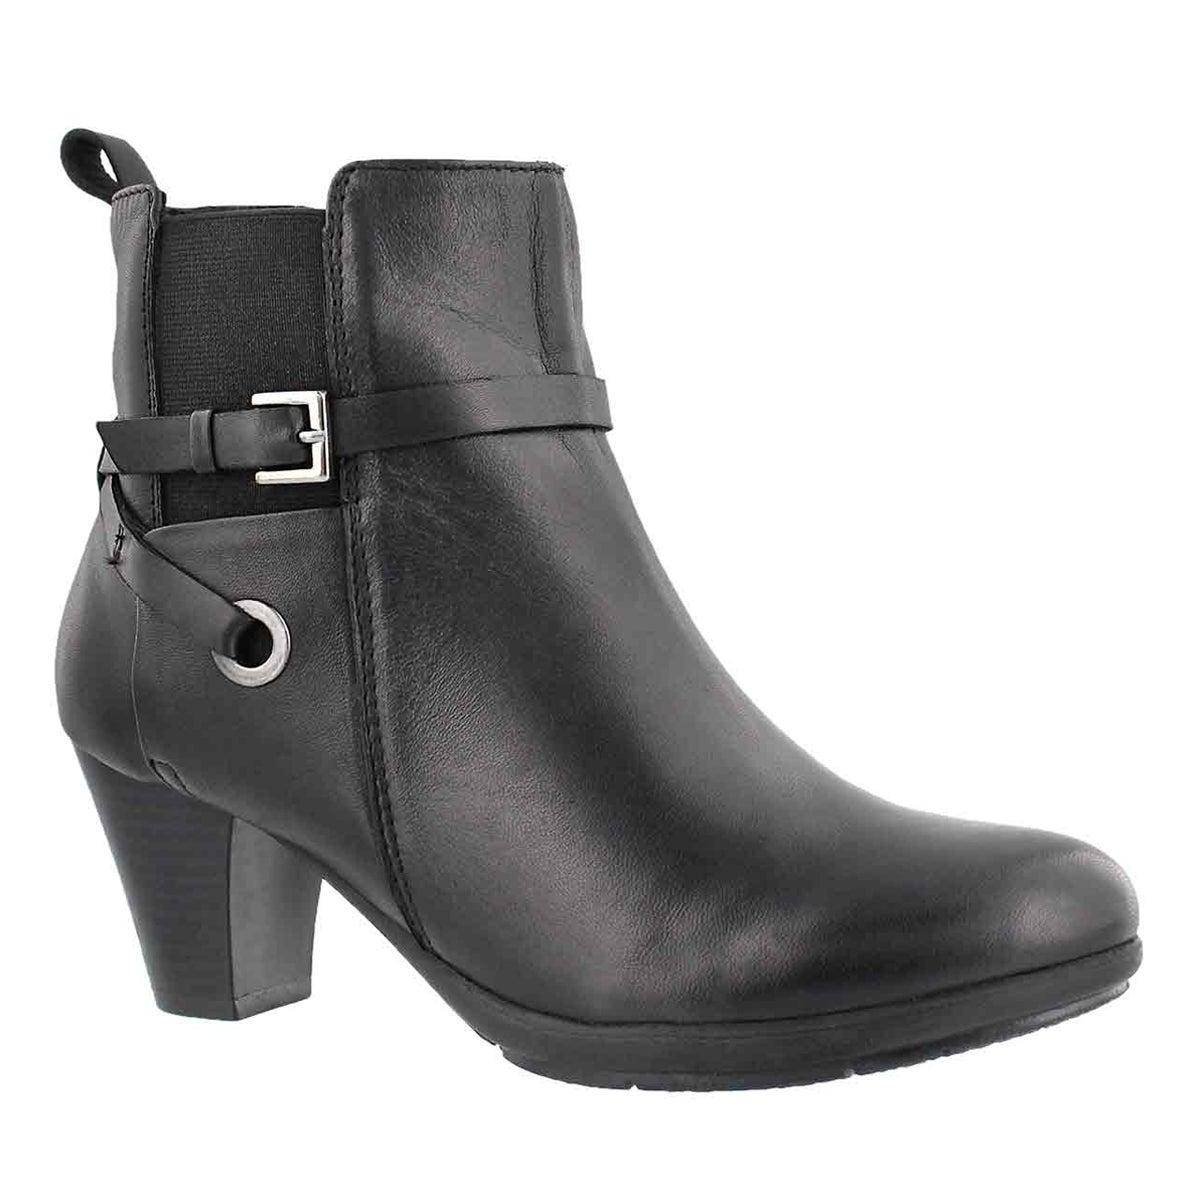 Women's DELICIA black dress bootie